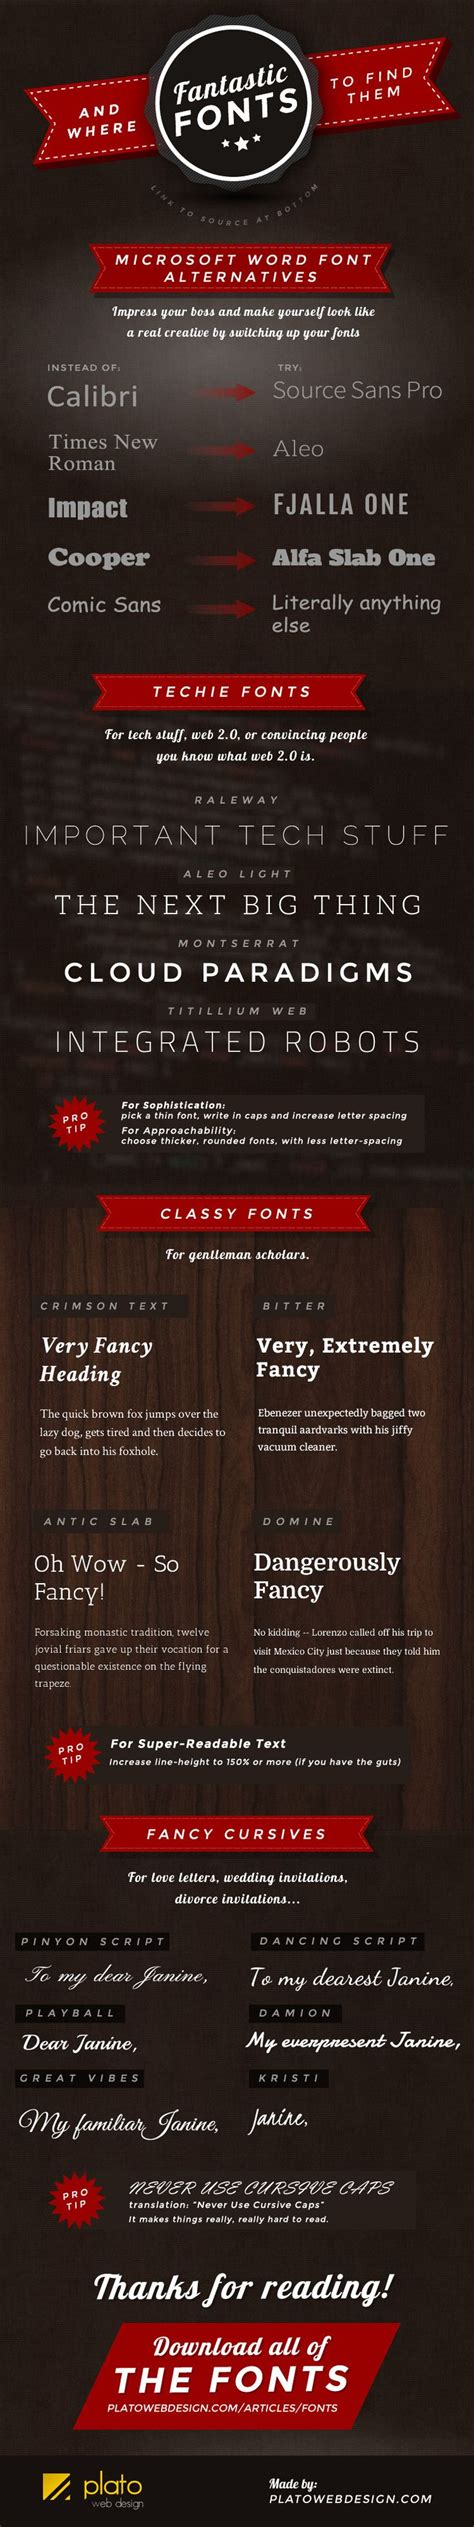 font design basics 605 best abc images on pinterest writing languages and